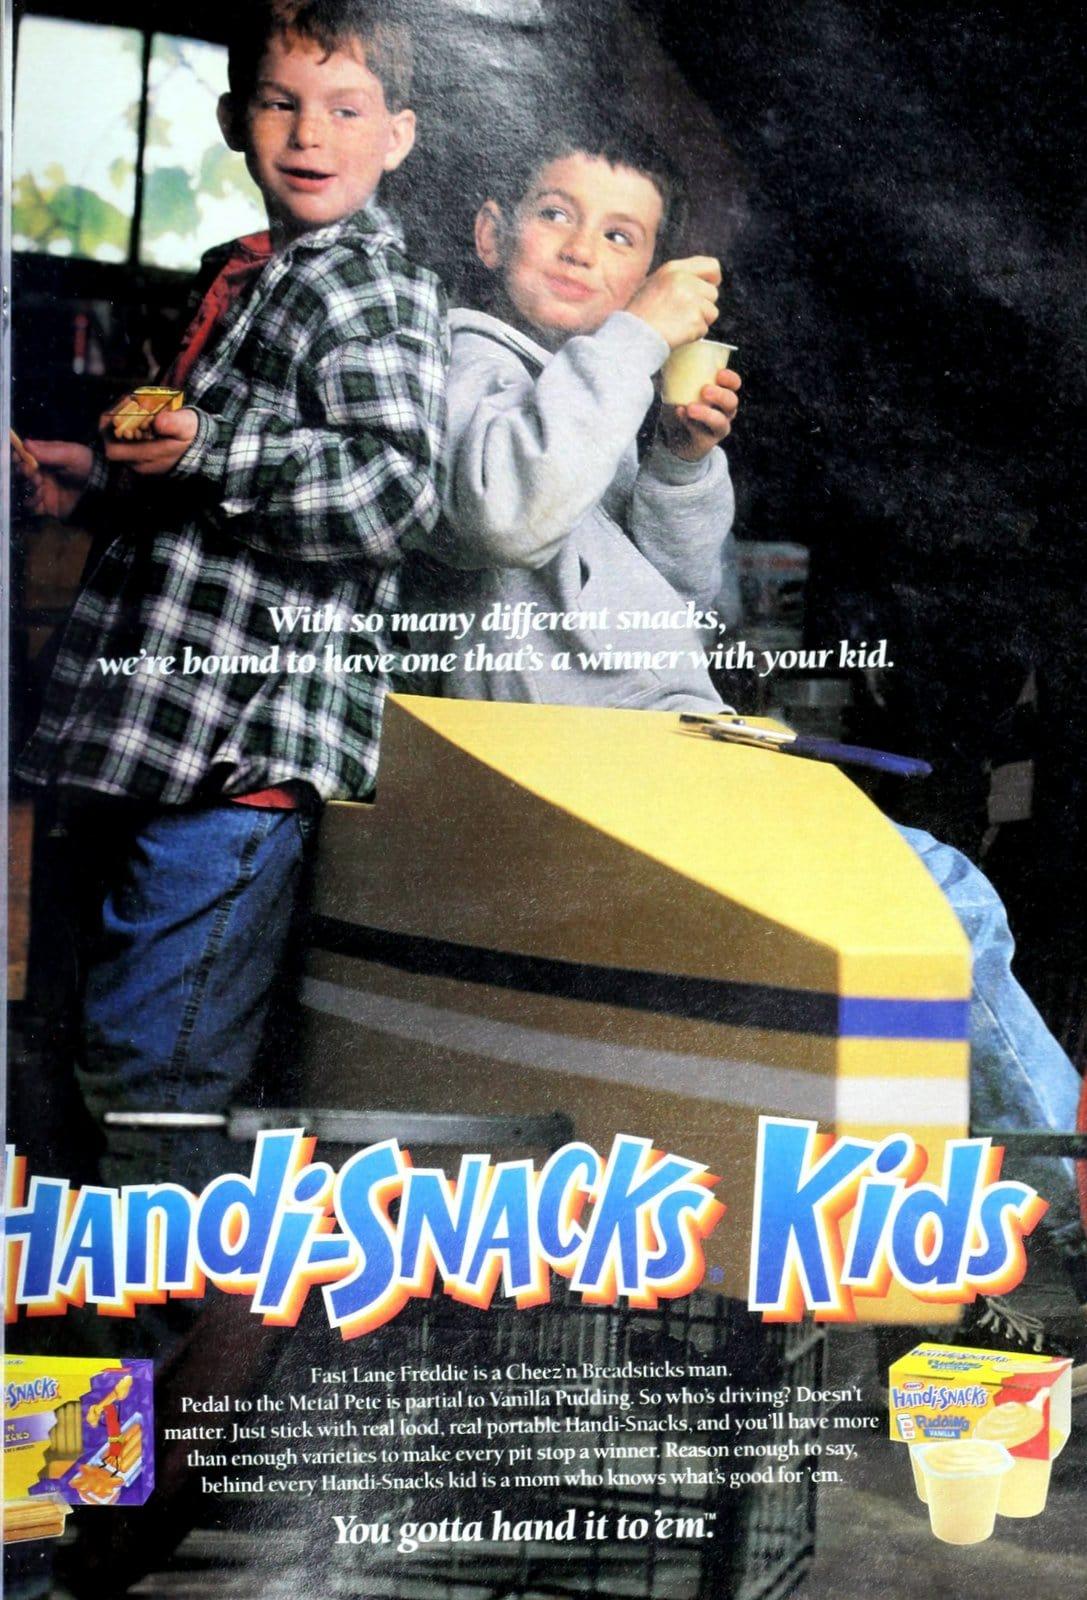 Handi-Snacks Kids vanilla pudding cups (1999)